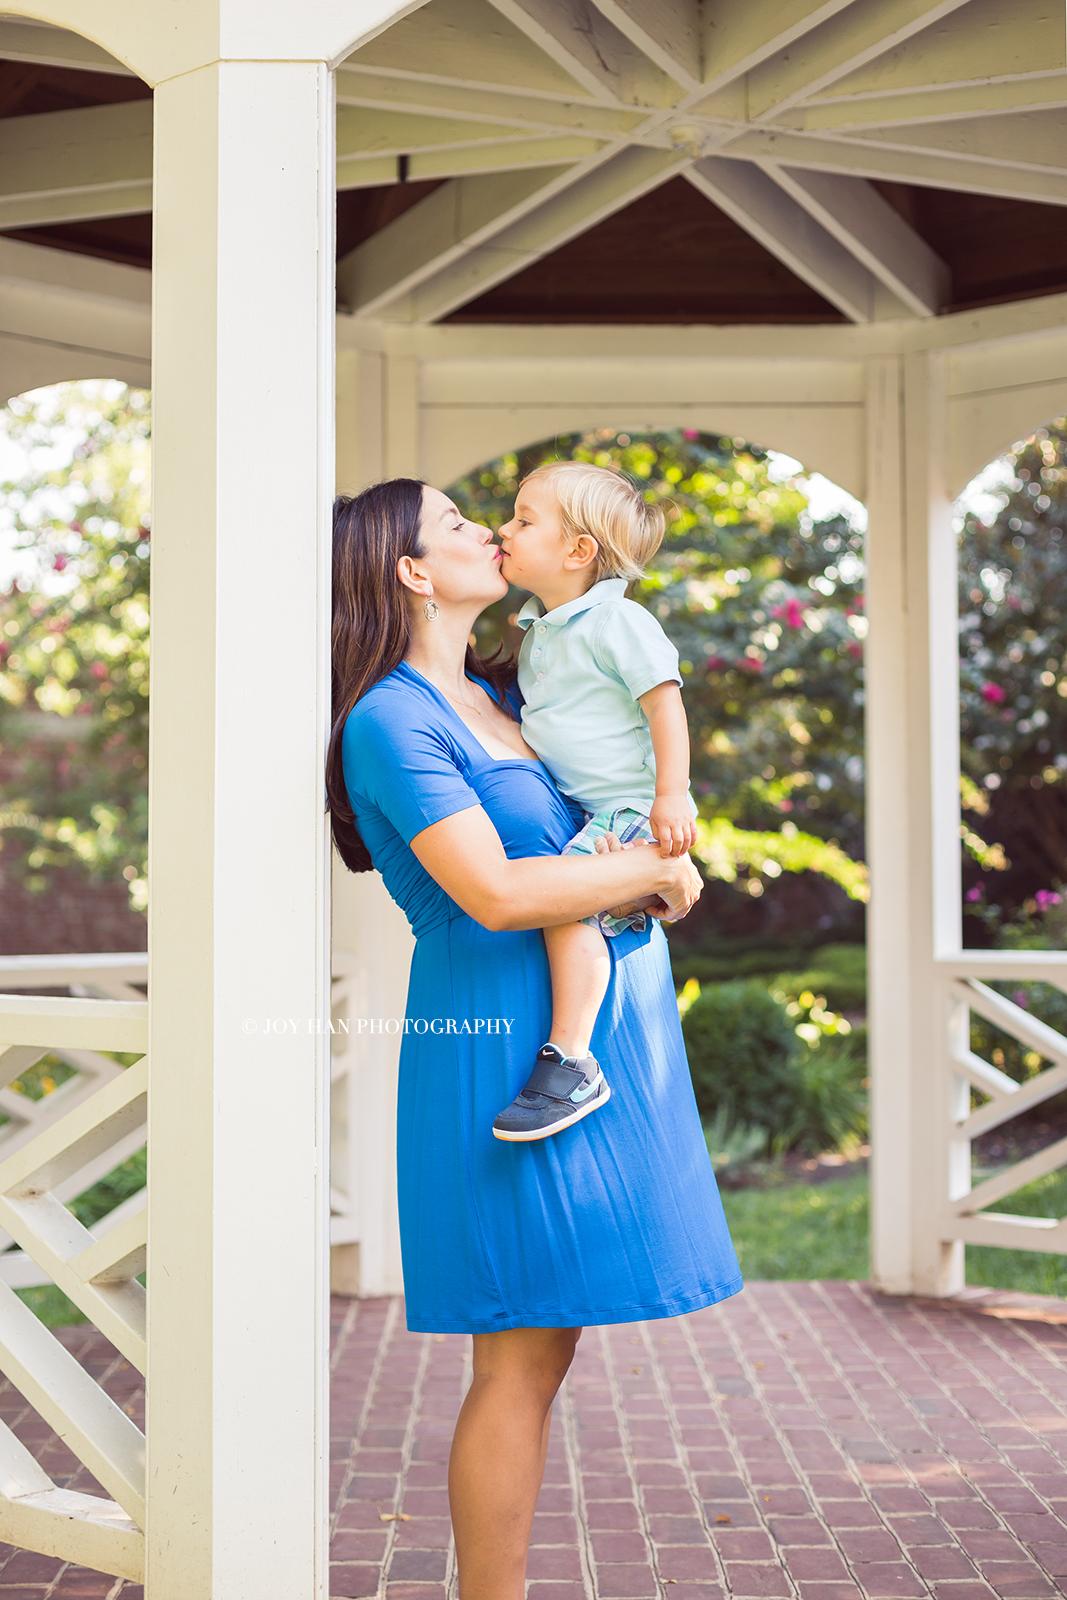 Lifestyle Maternity Photography | Maternity Photographer in Leesburg VA